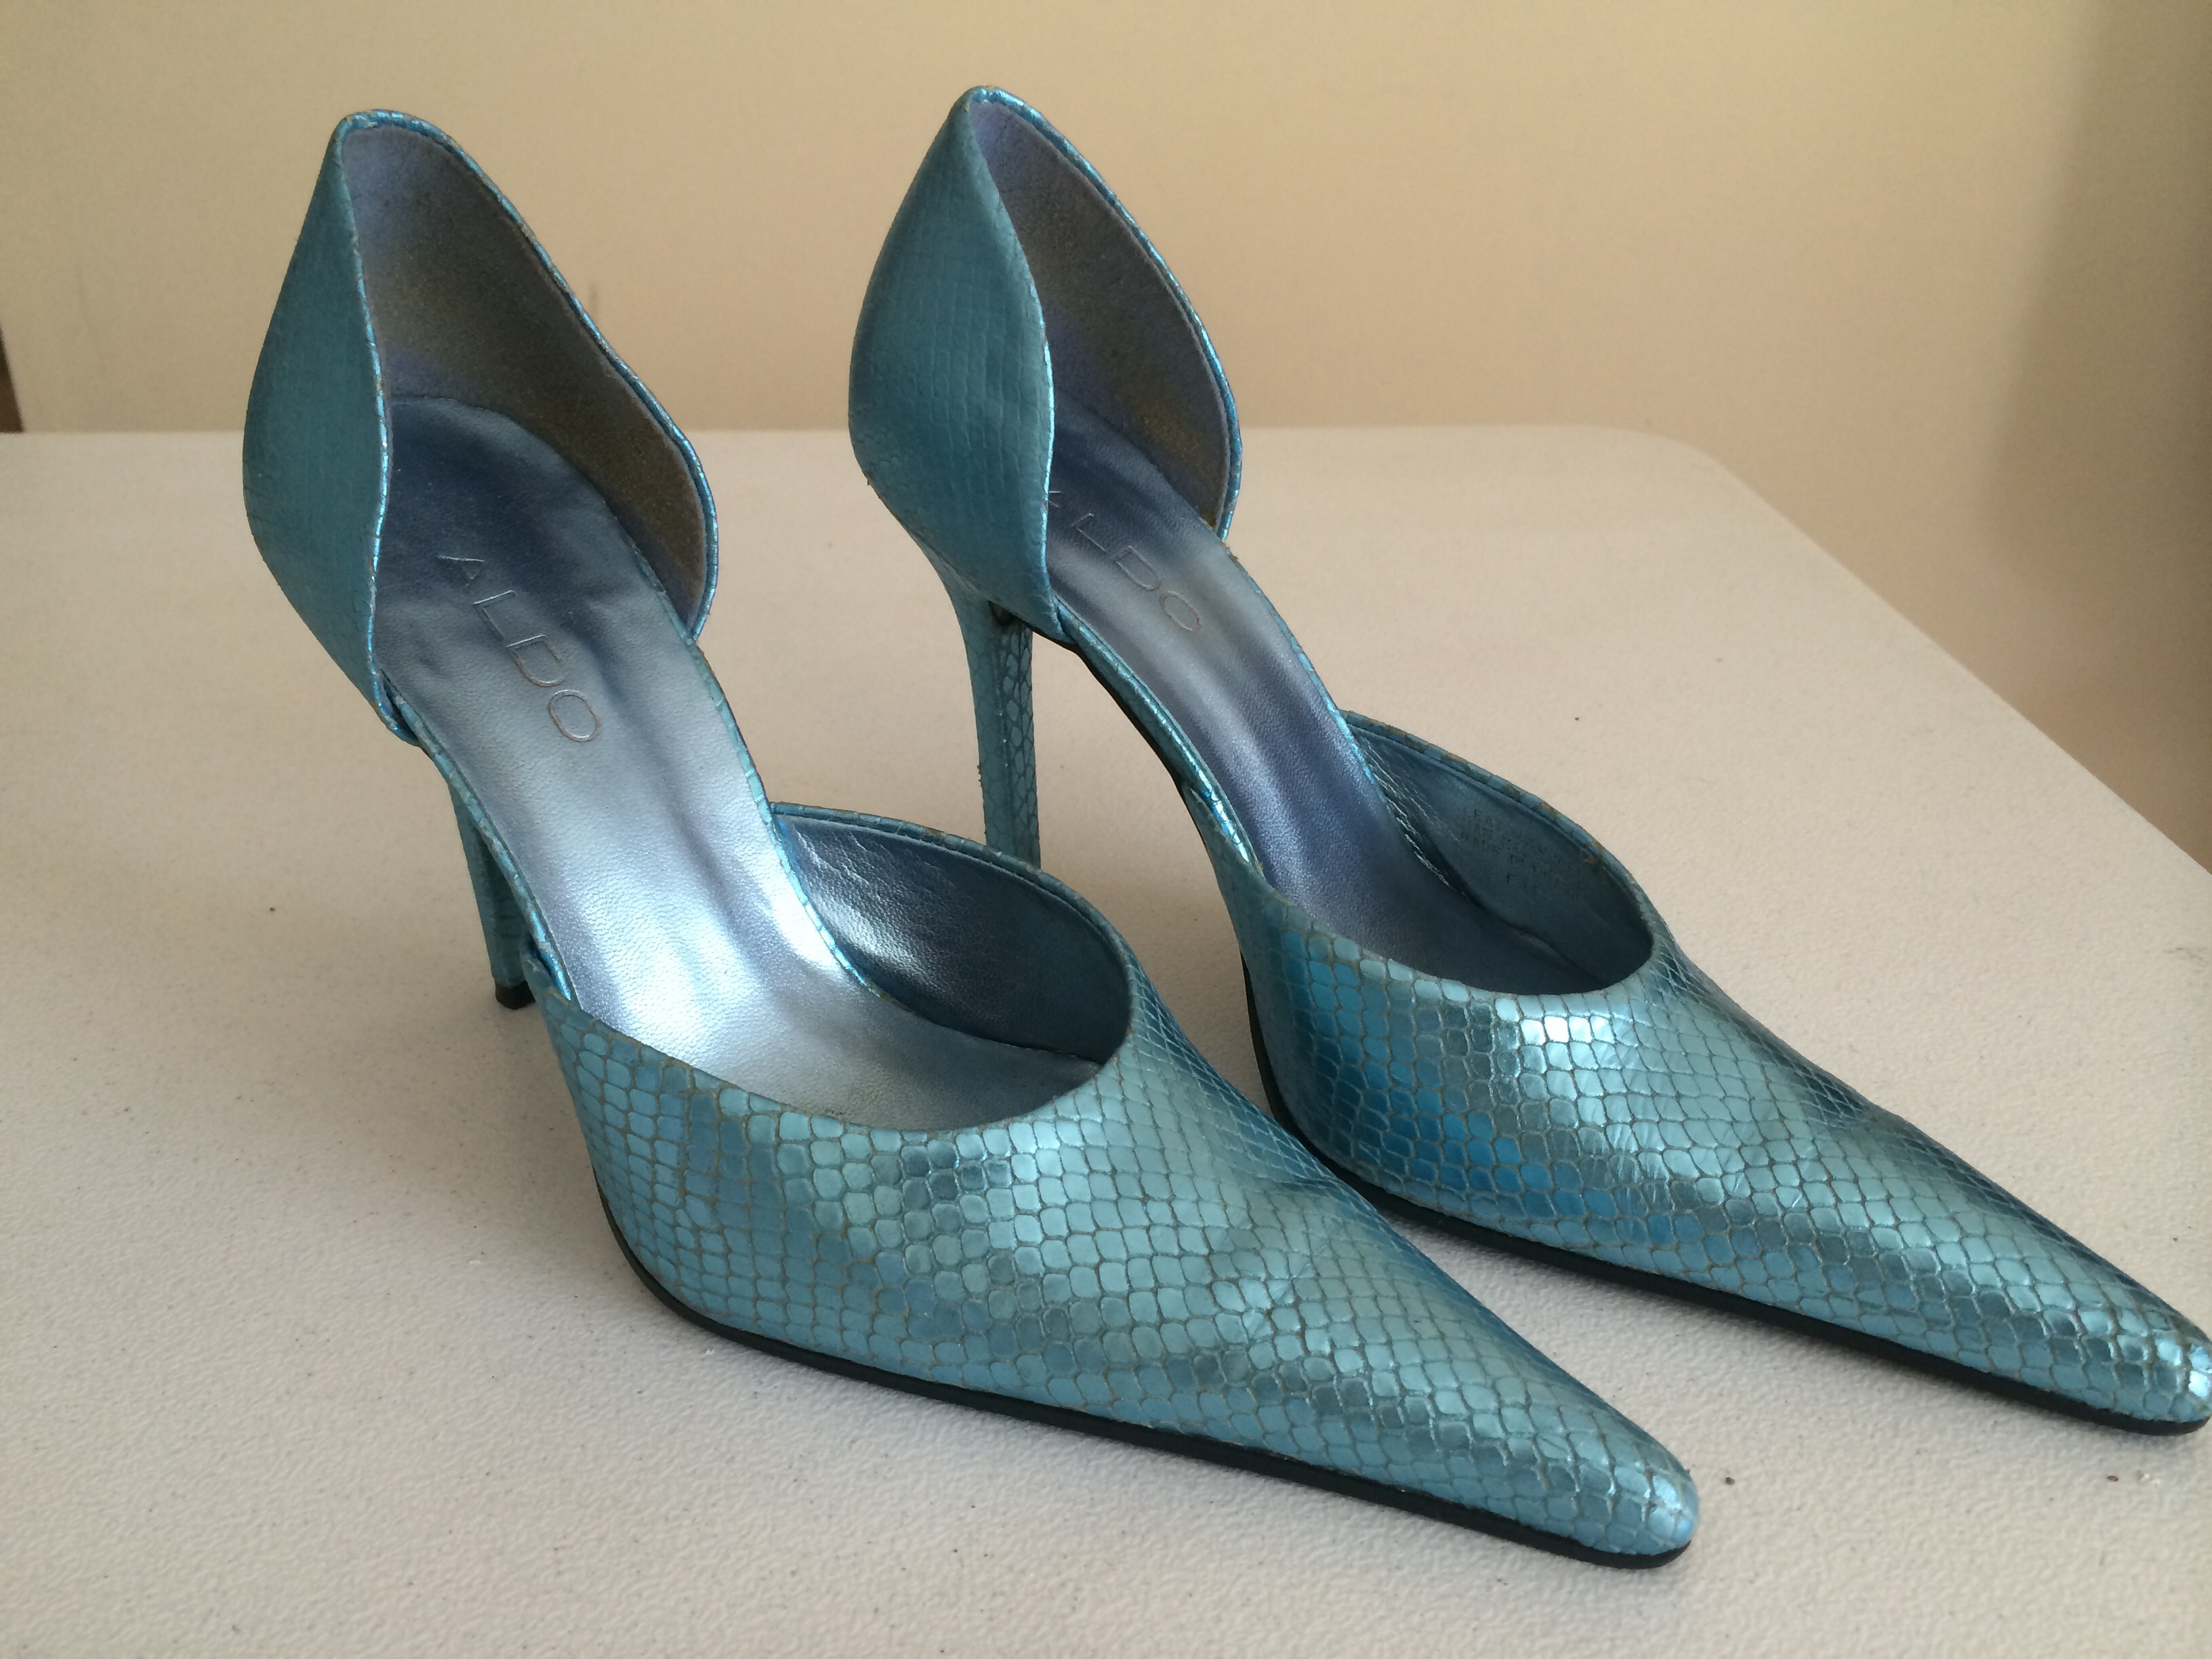 49efe36085f Size 38 Aldo Blue Metallic Snakeskin Pumps from Wooden Hanger Consignment